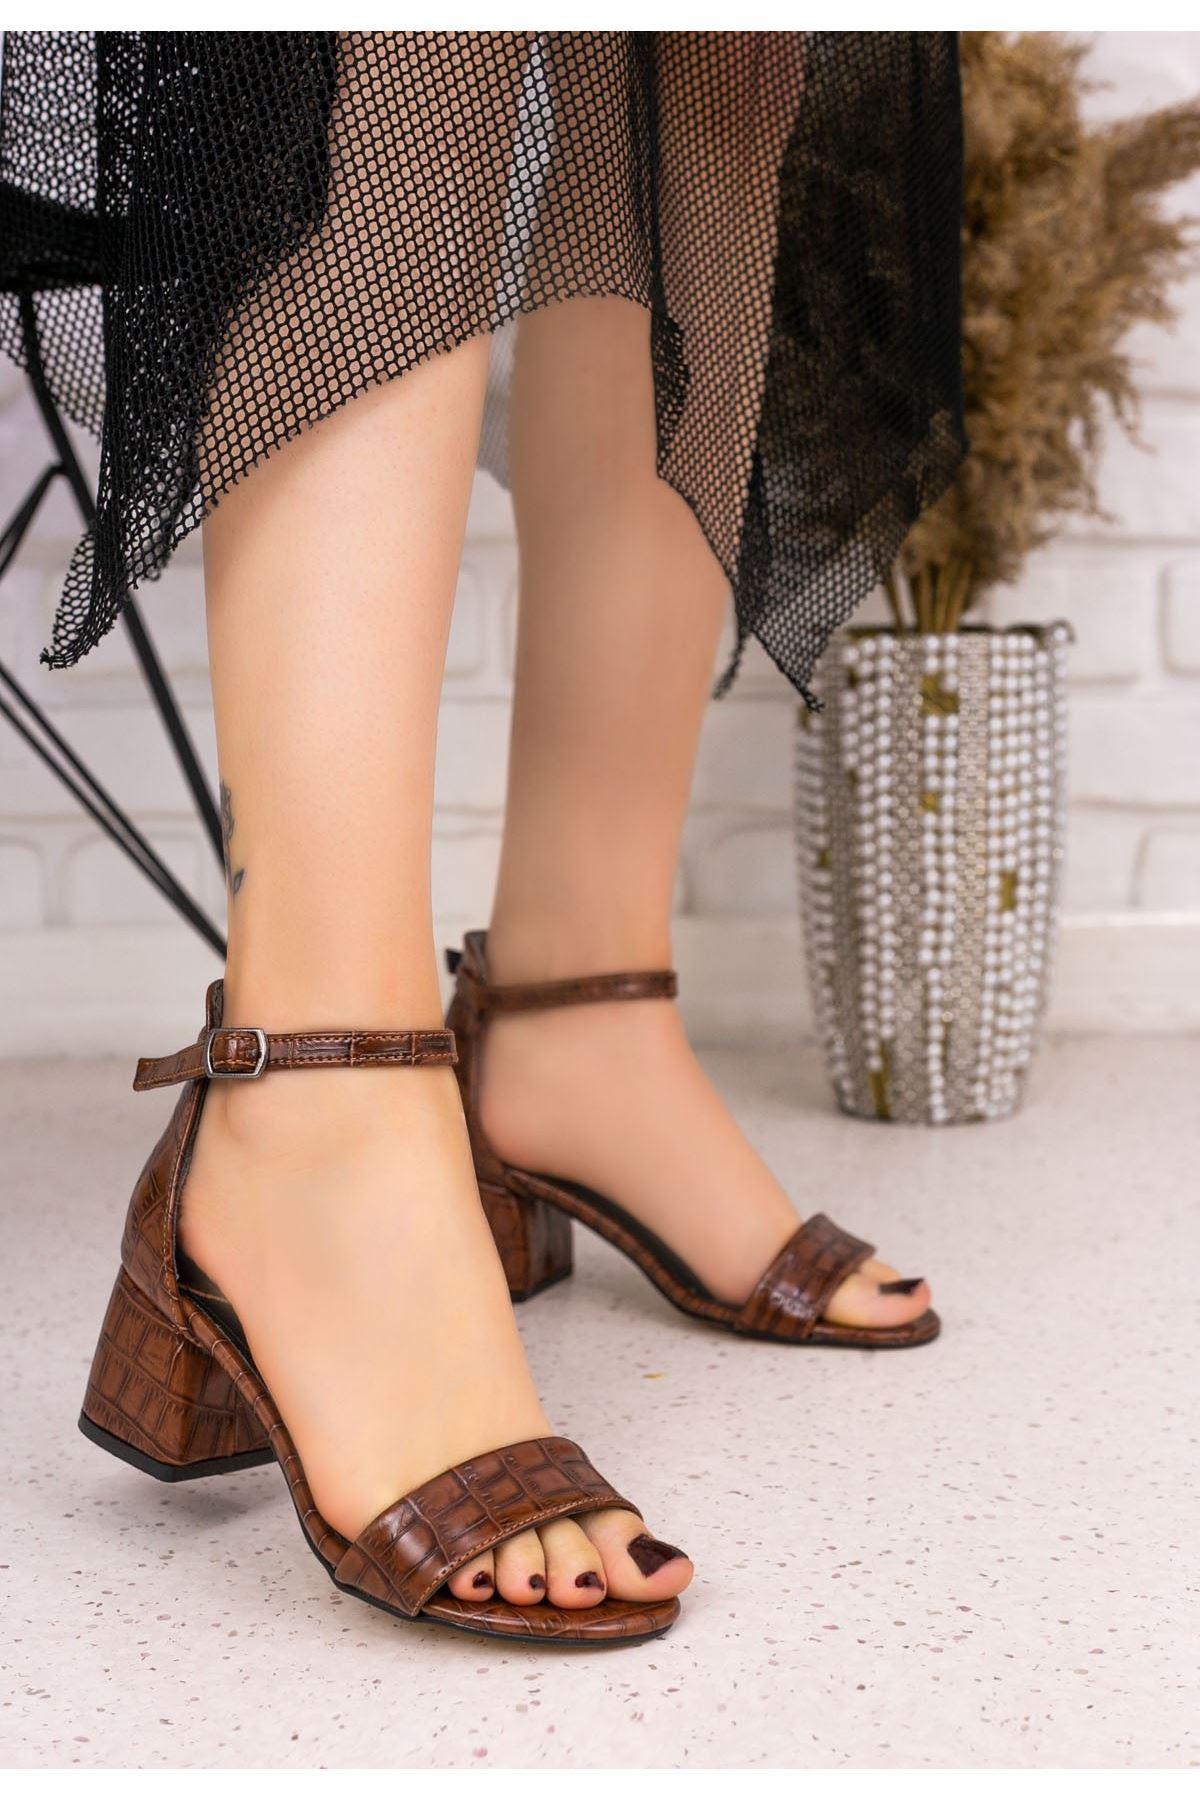 Epon Kahverengi Cilt Desenli Tek Bant Topuklu Ayakkabı